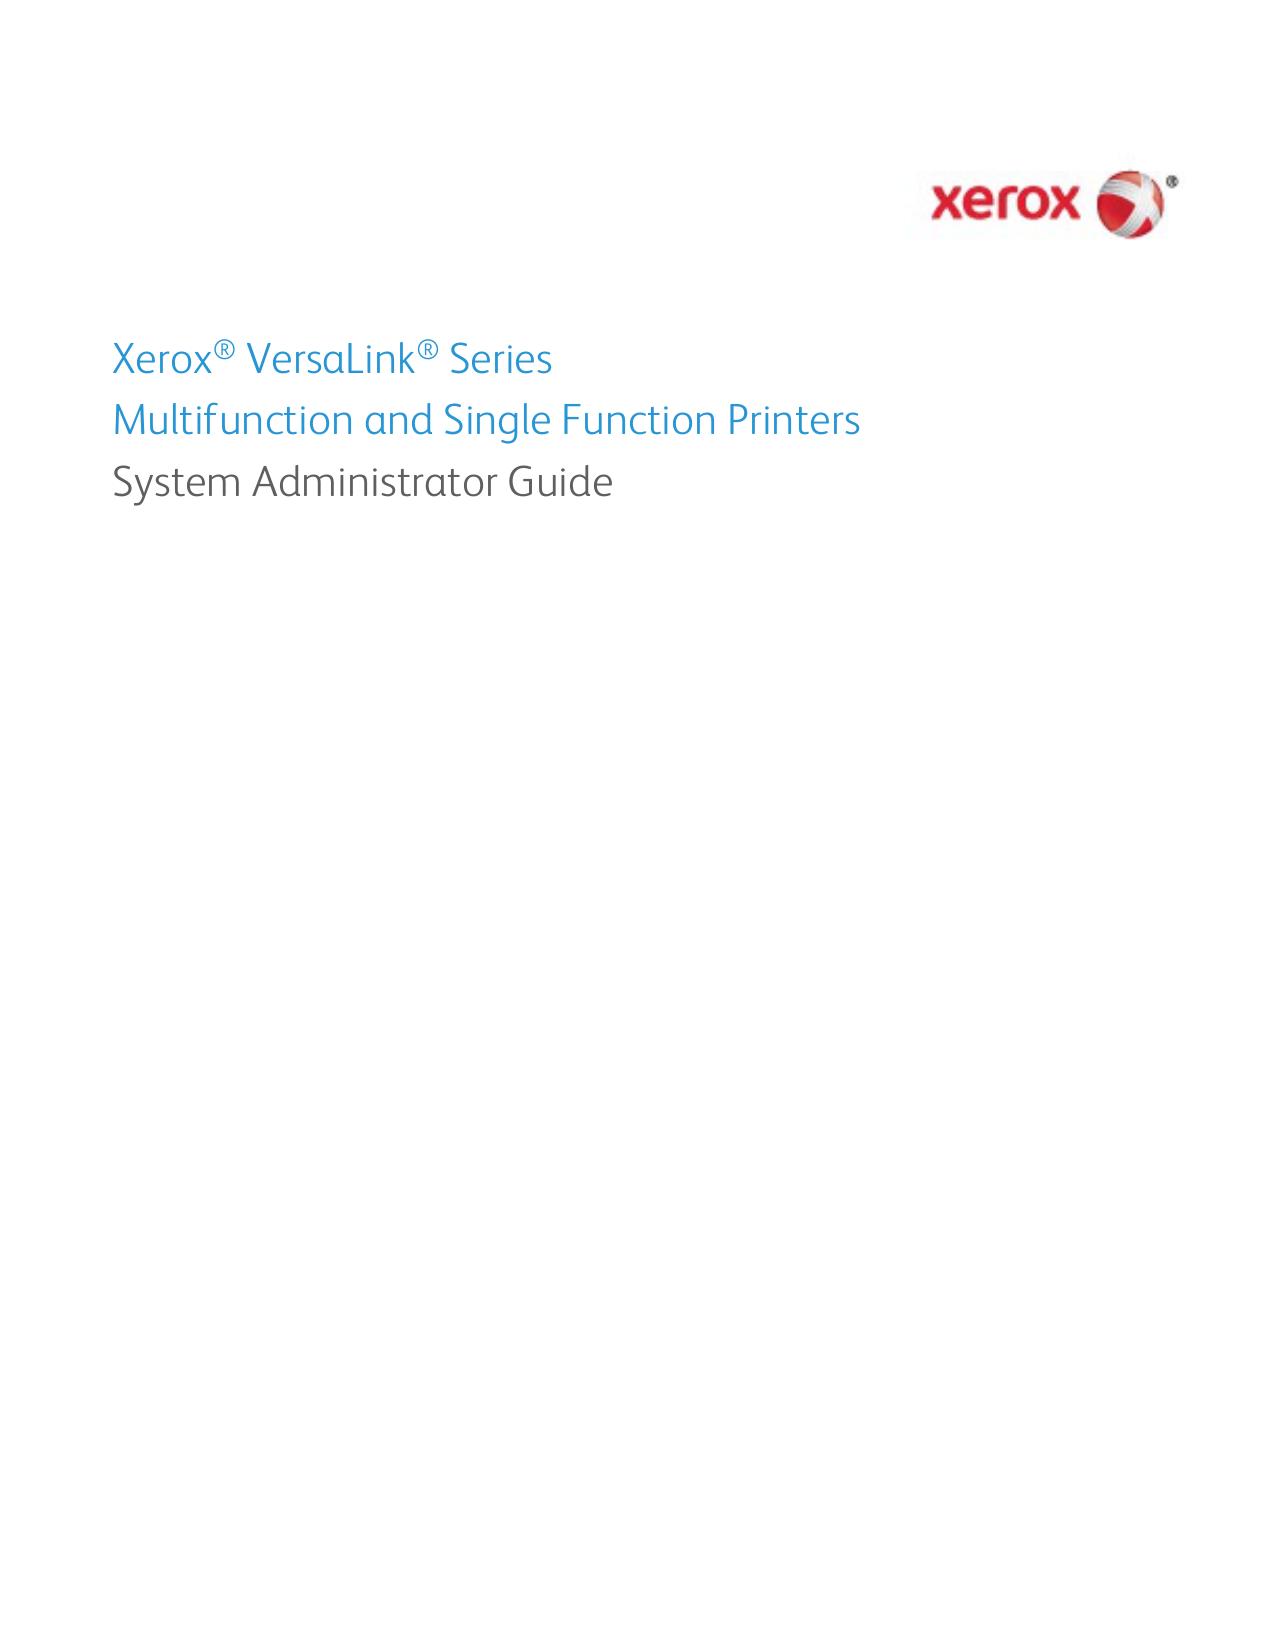 Xerox® VersaLink® Series Multifunction and Single Function